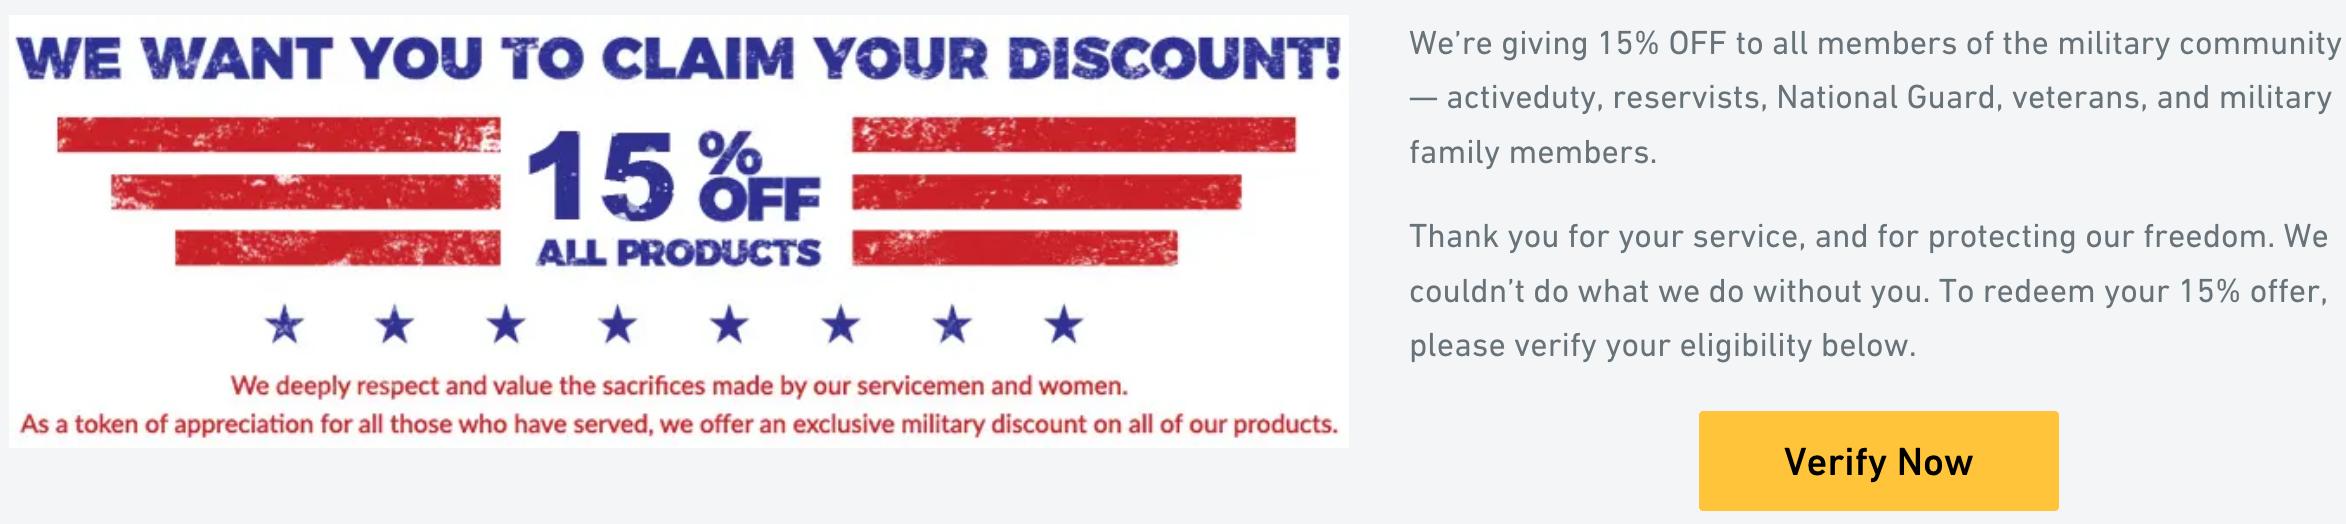 Veterans Nation Military Veteran Discounts